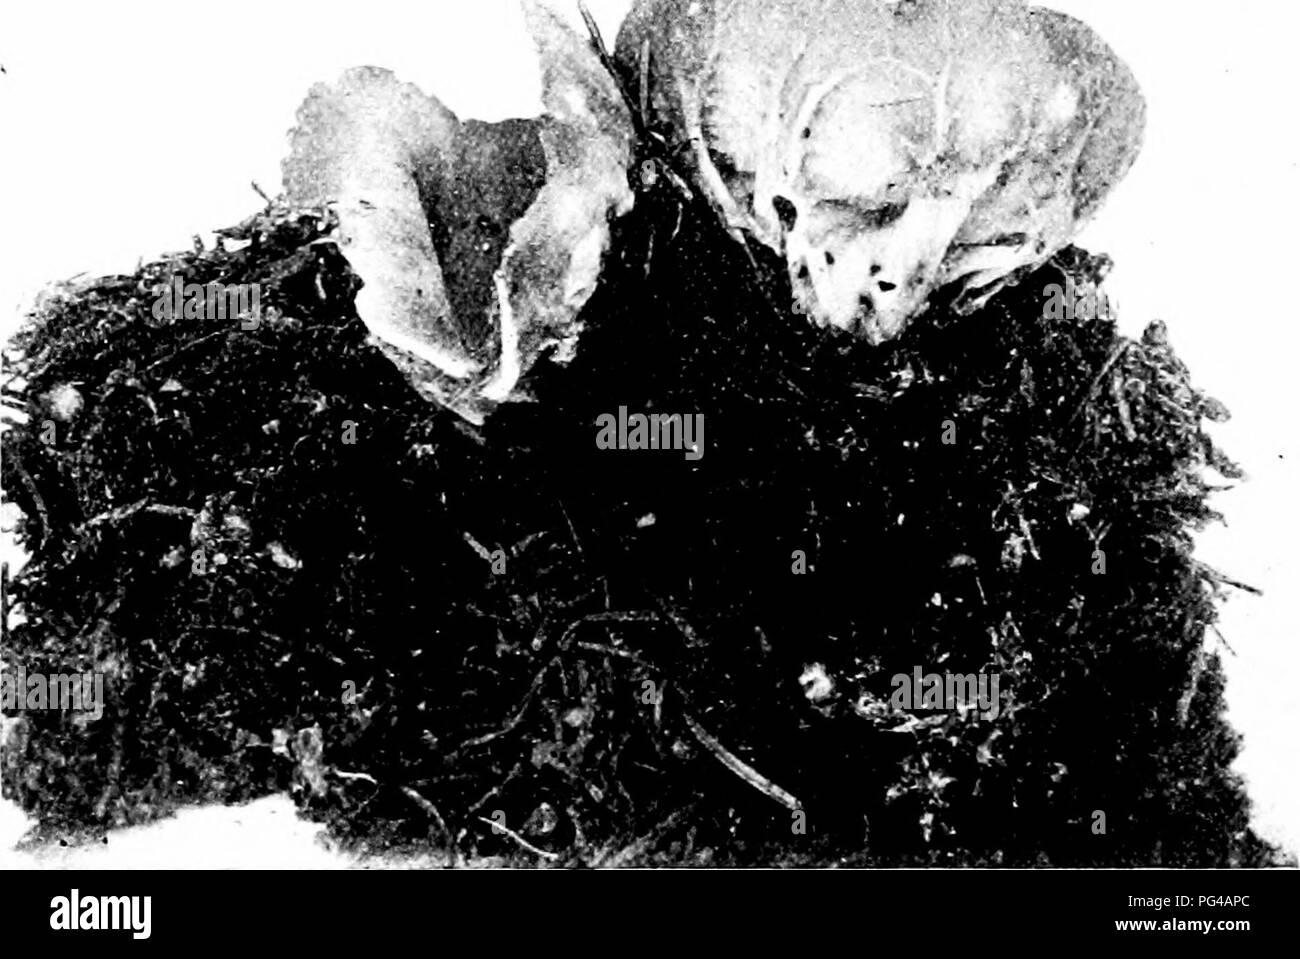 Fli Black and White Stock Photos & Images - Alamy